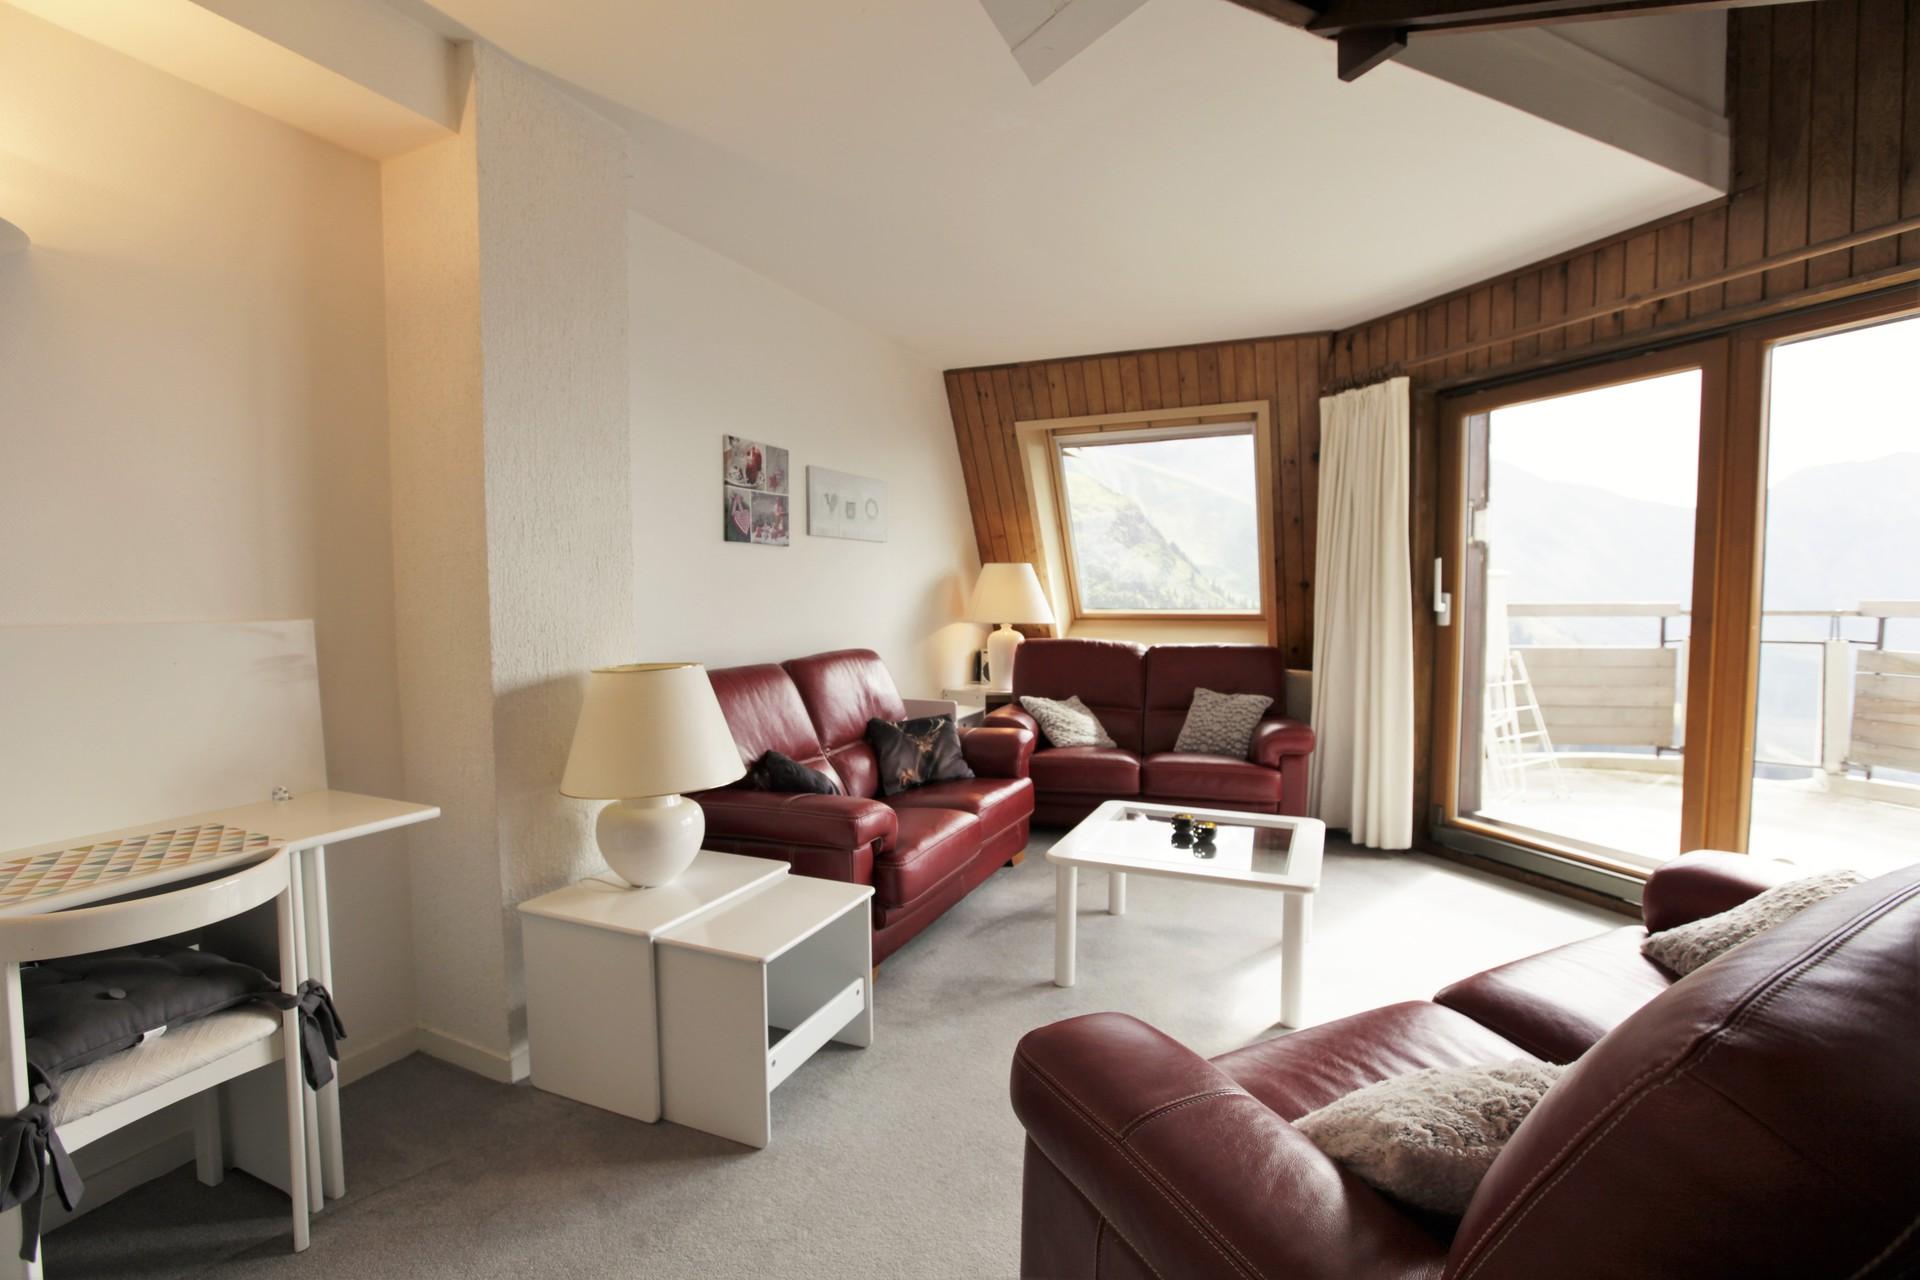 Rent a 4-rooms-(3-bedrooms) at Avoriaz